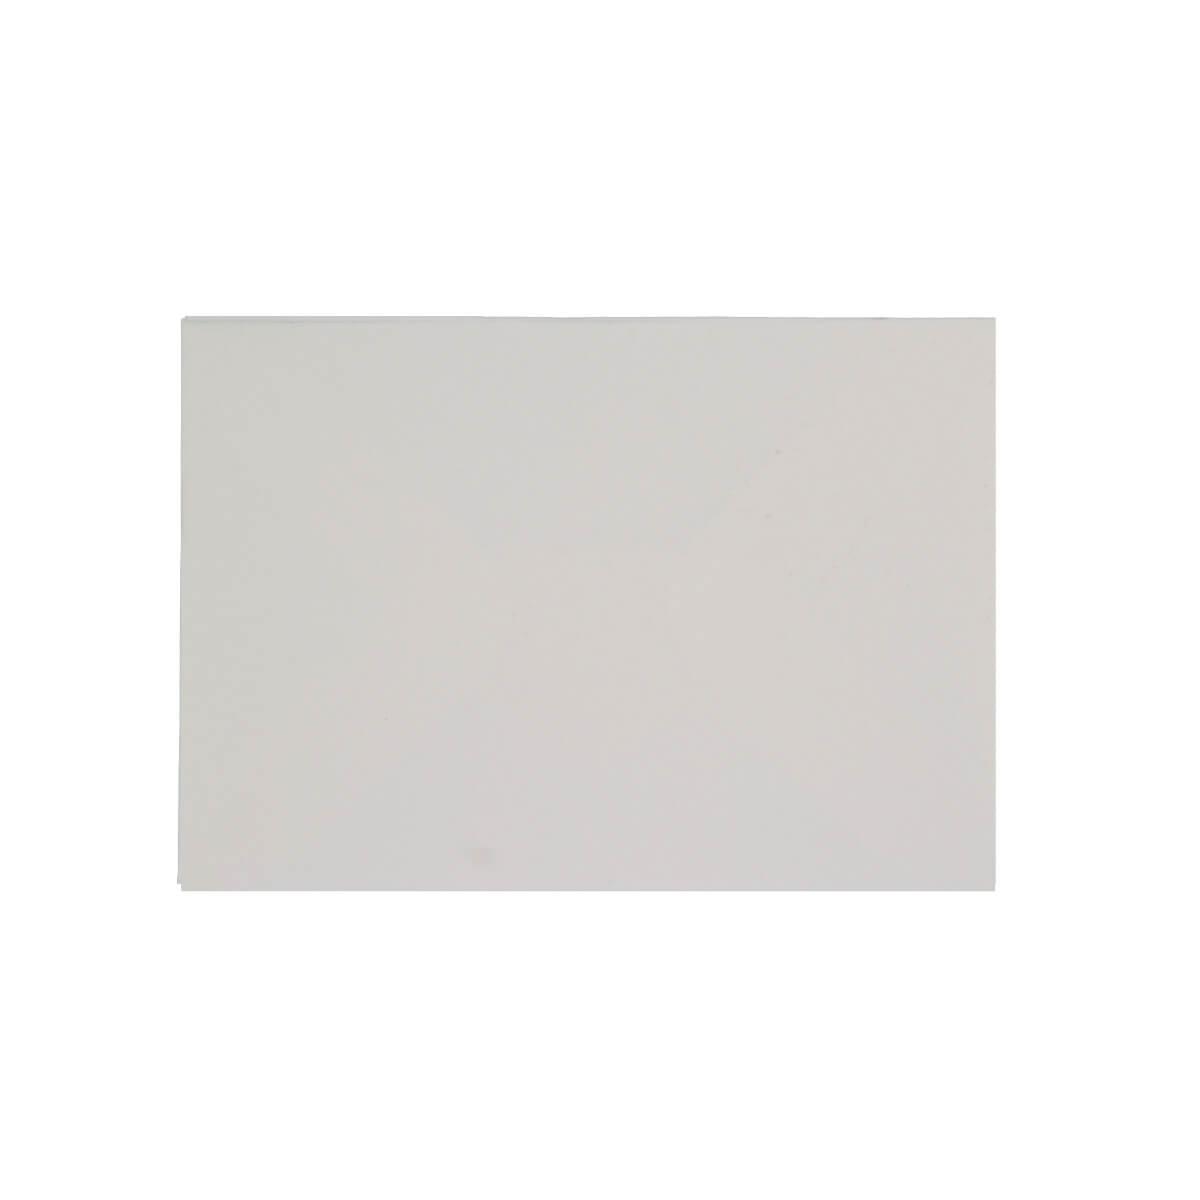 WHITE HAMMER EFFECT 70 x 100mm GIFT TAG ENVELOPE (i2)